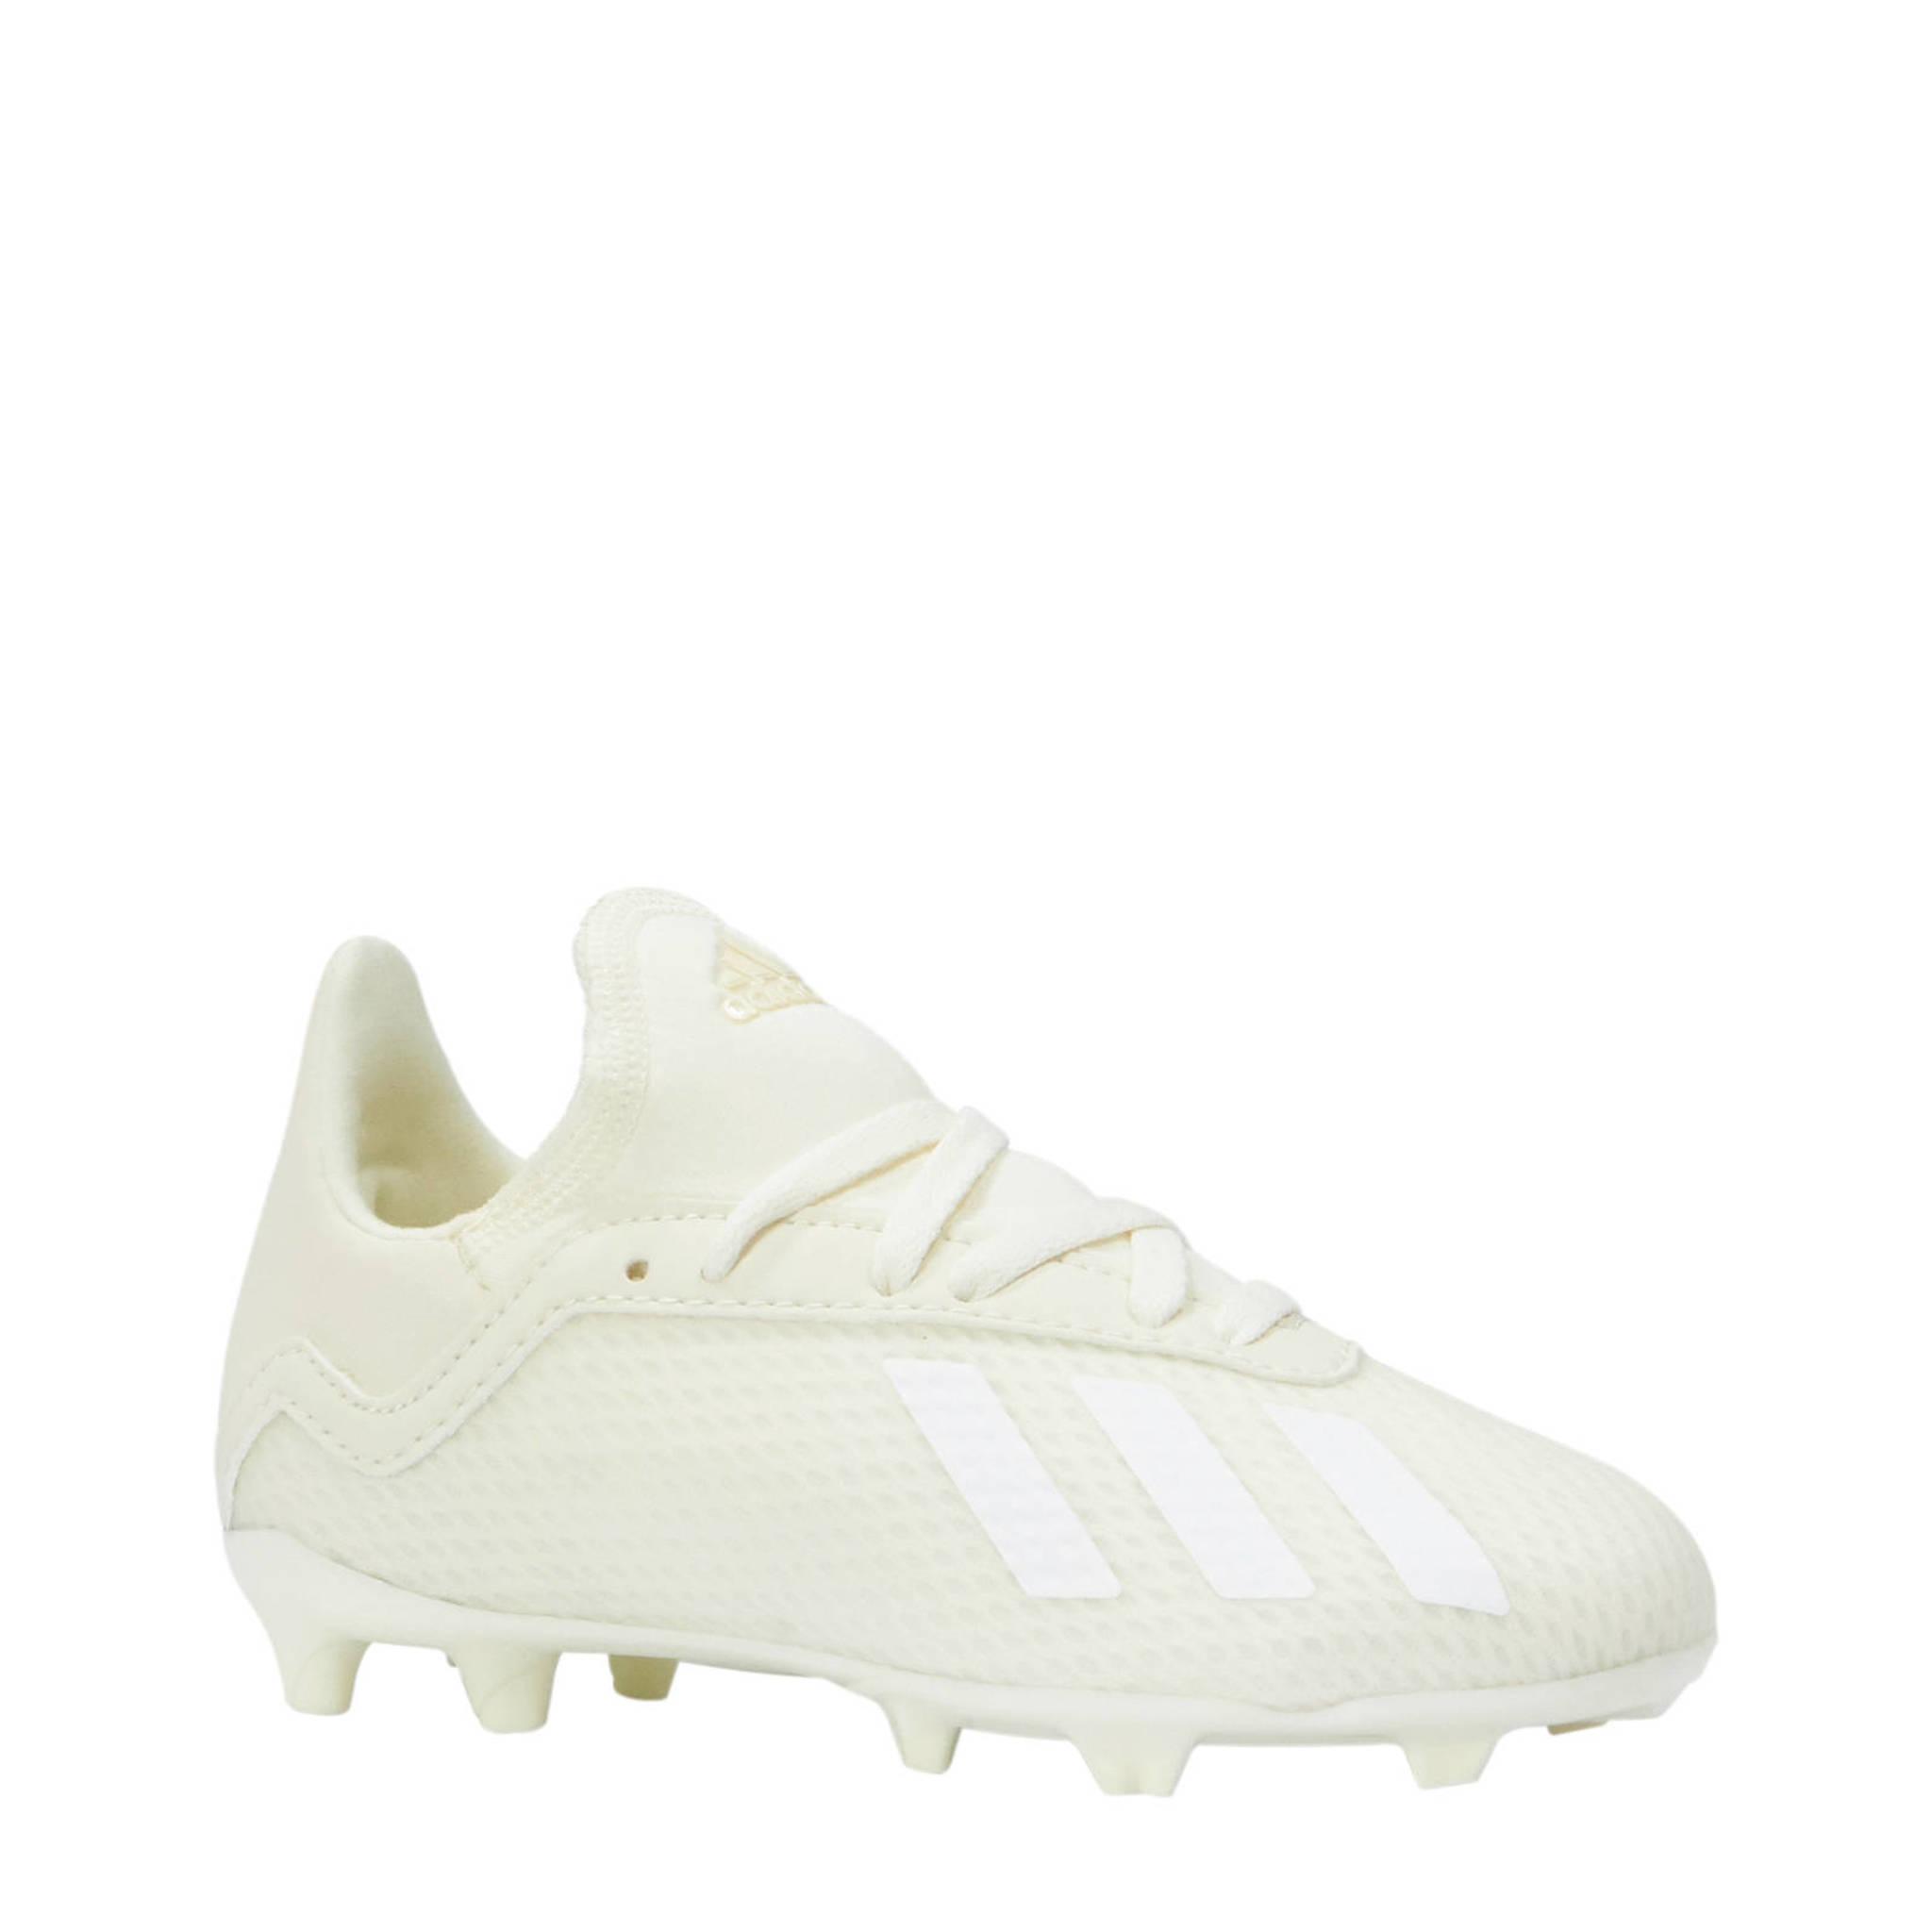 a5f3330dcf3 adidas performance X 18.3 FG J voetbalschoenen gebroken wit | wehkamp